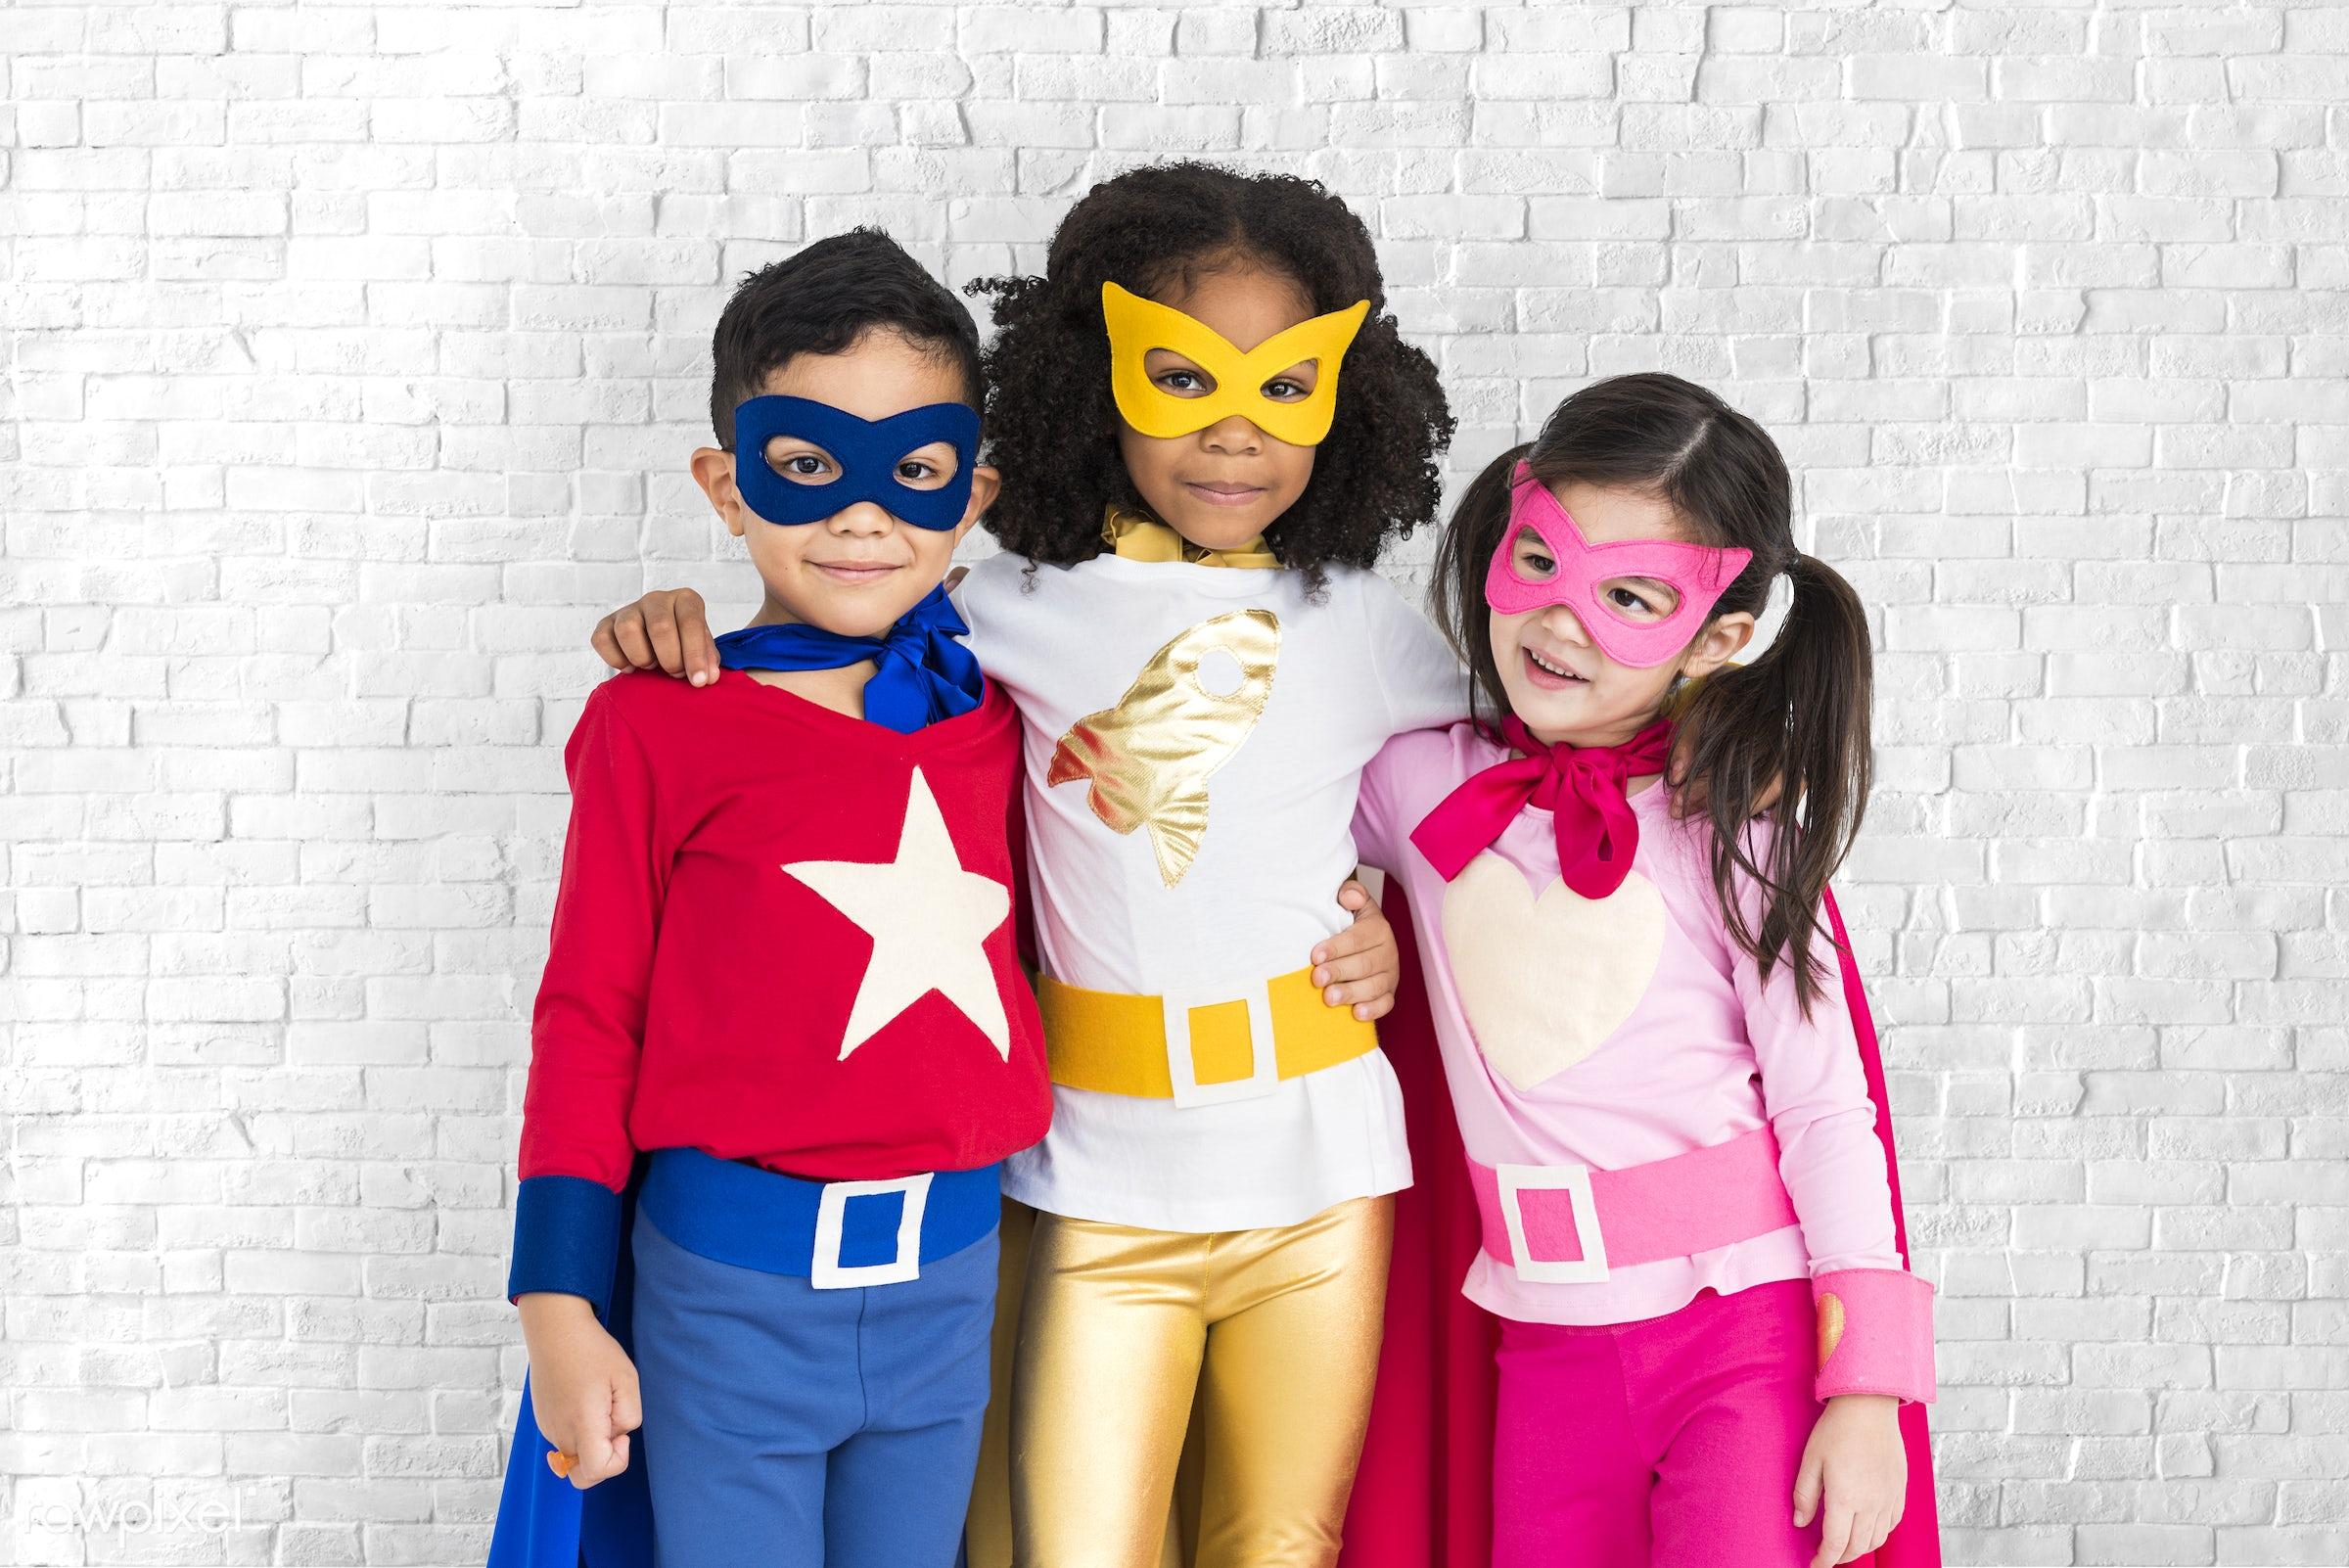 brick, children, courageous, kid, adolescence, child, girl, inspiration, leader, idol, childhood, superhero, isolated, hero...